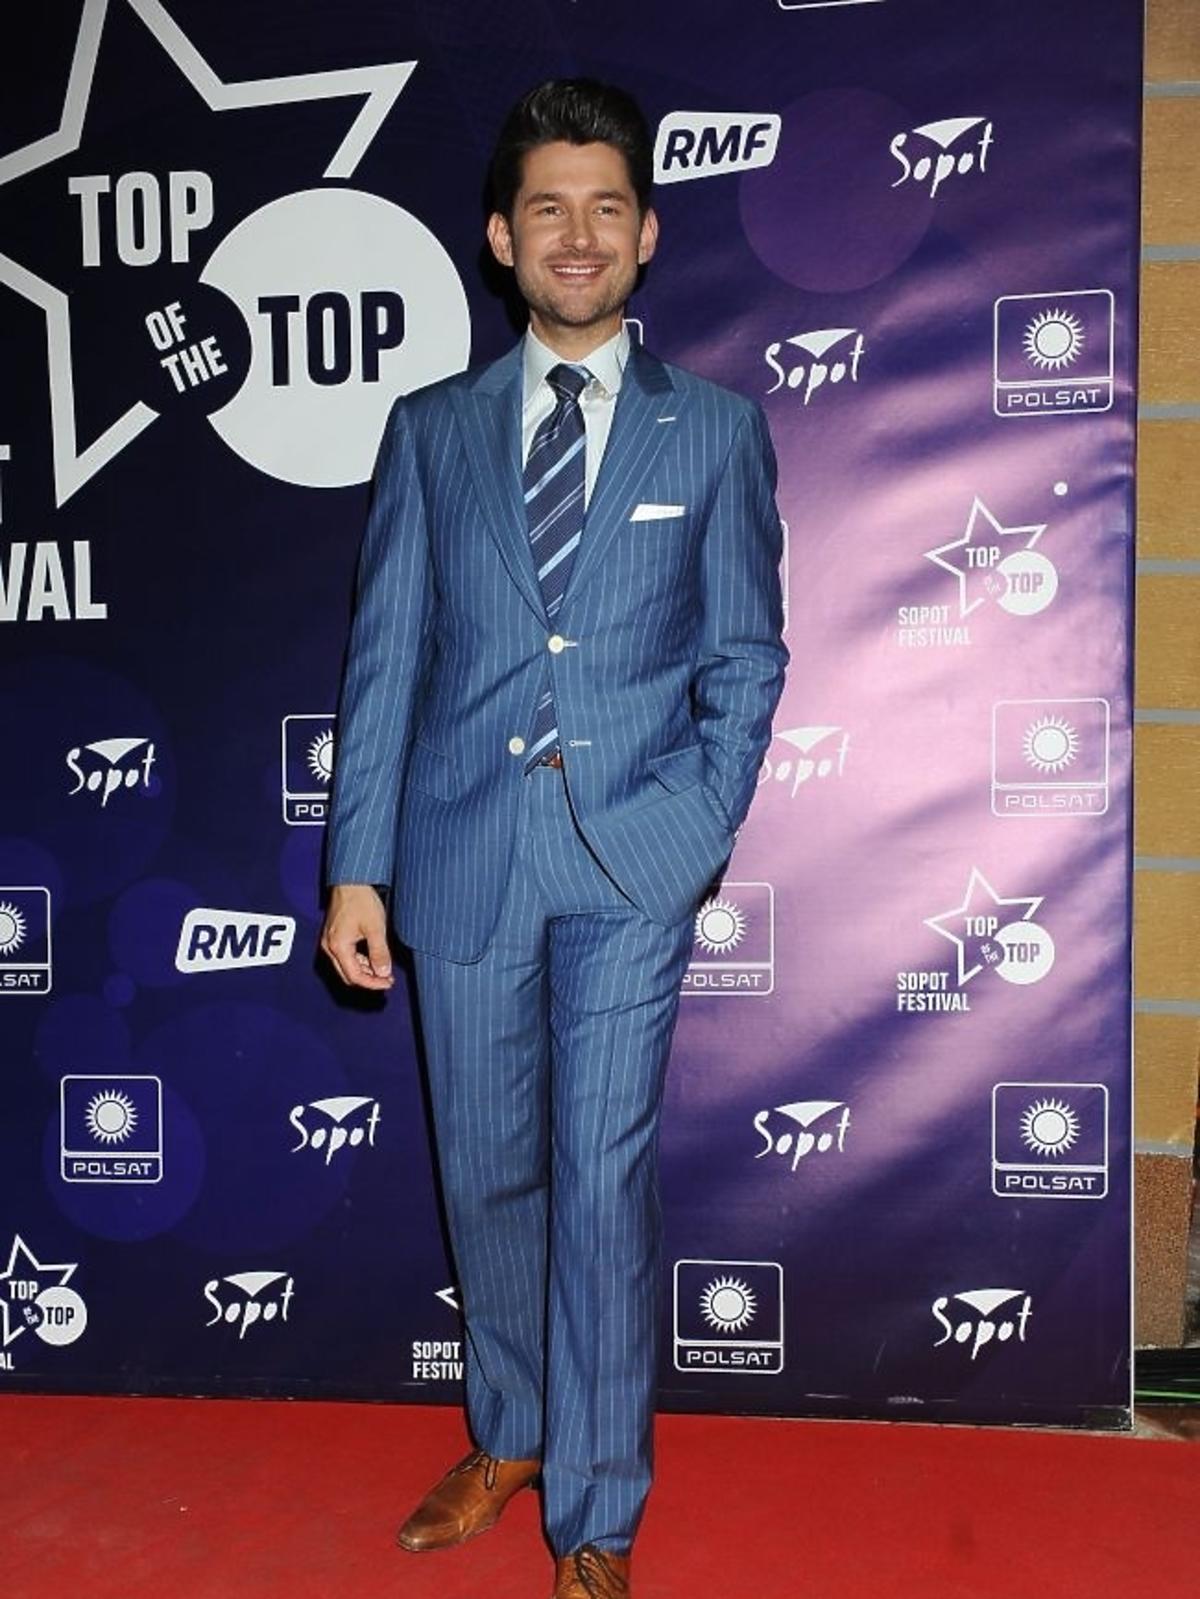 Matt Dusk podczas pierwszego dnia Sopot Top of the Top Festival 2013